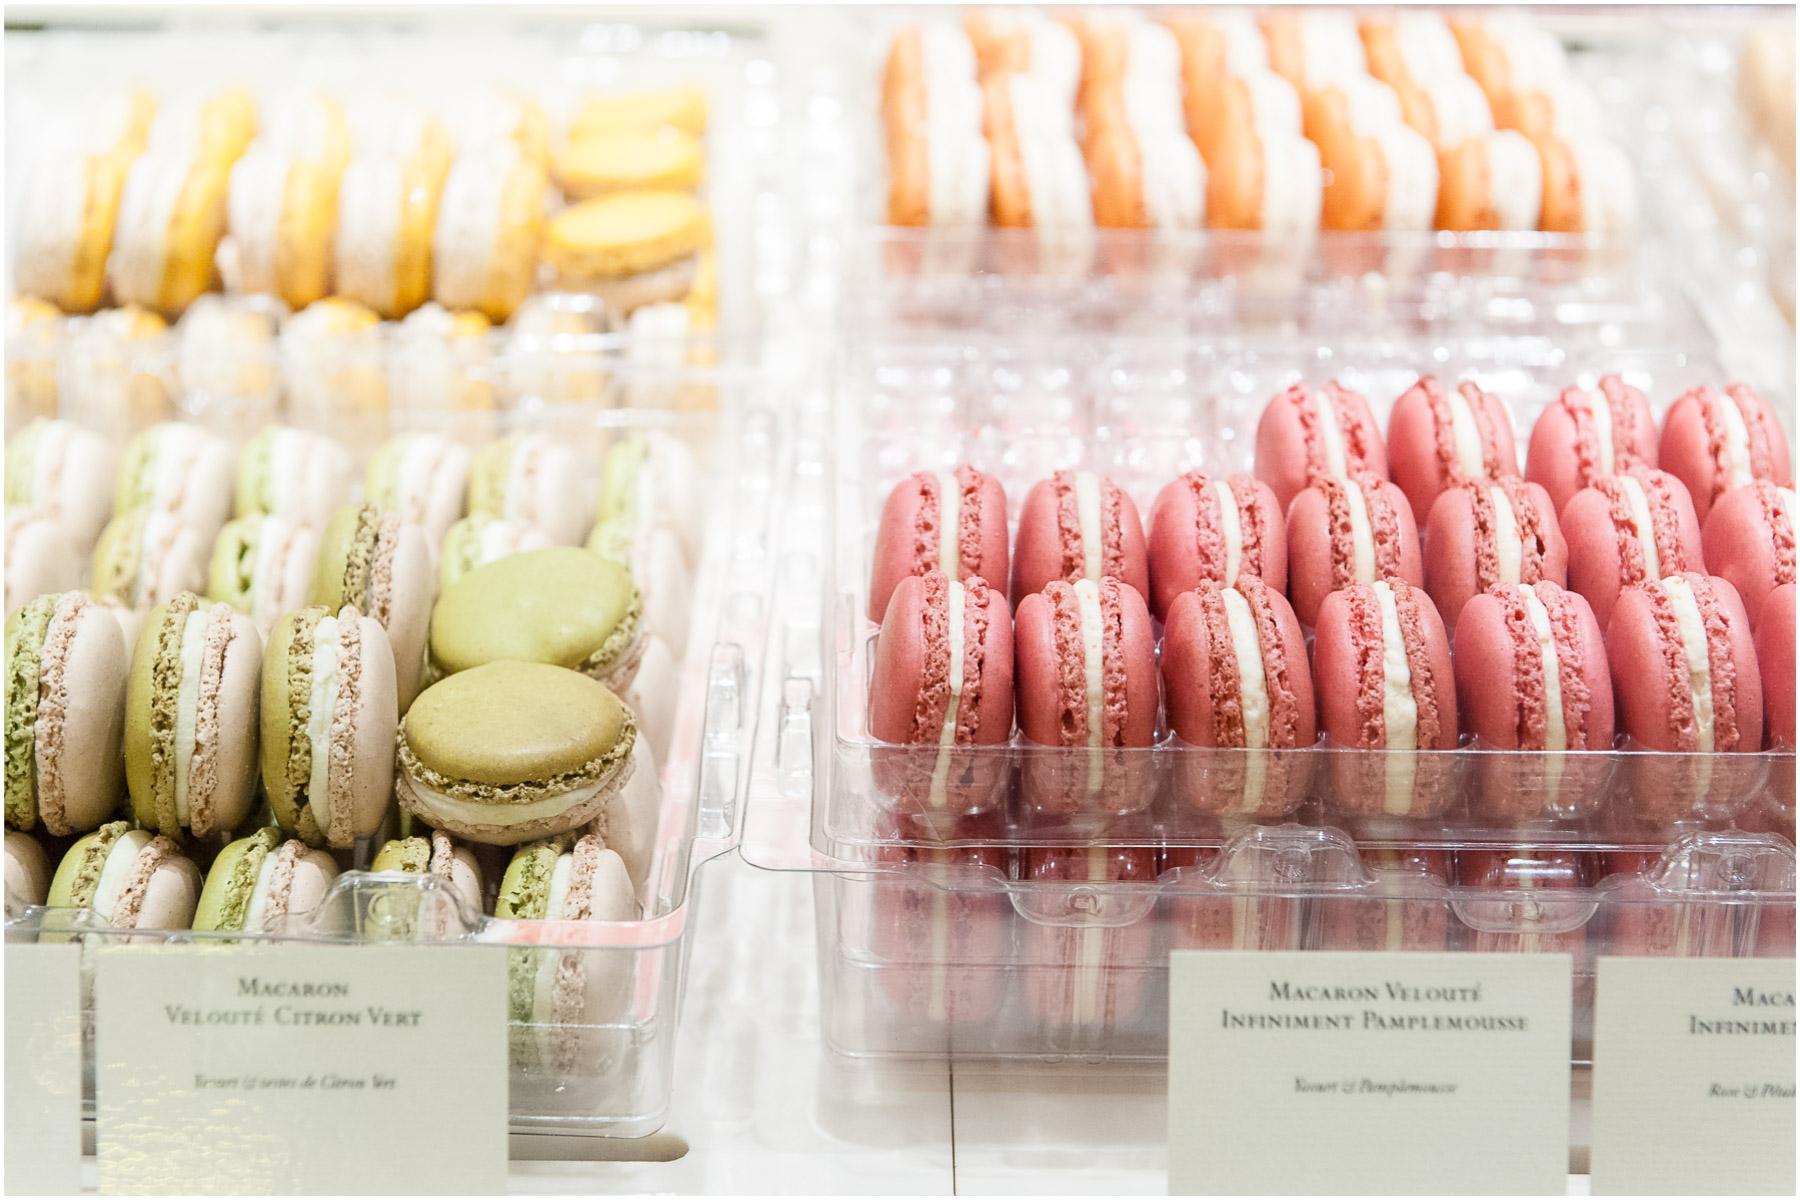 Parisian-Bakeris-Chocolate-Shop_8.jpg